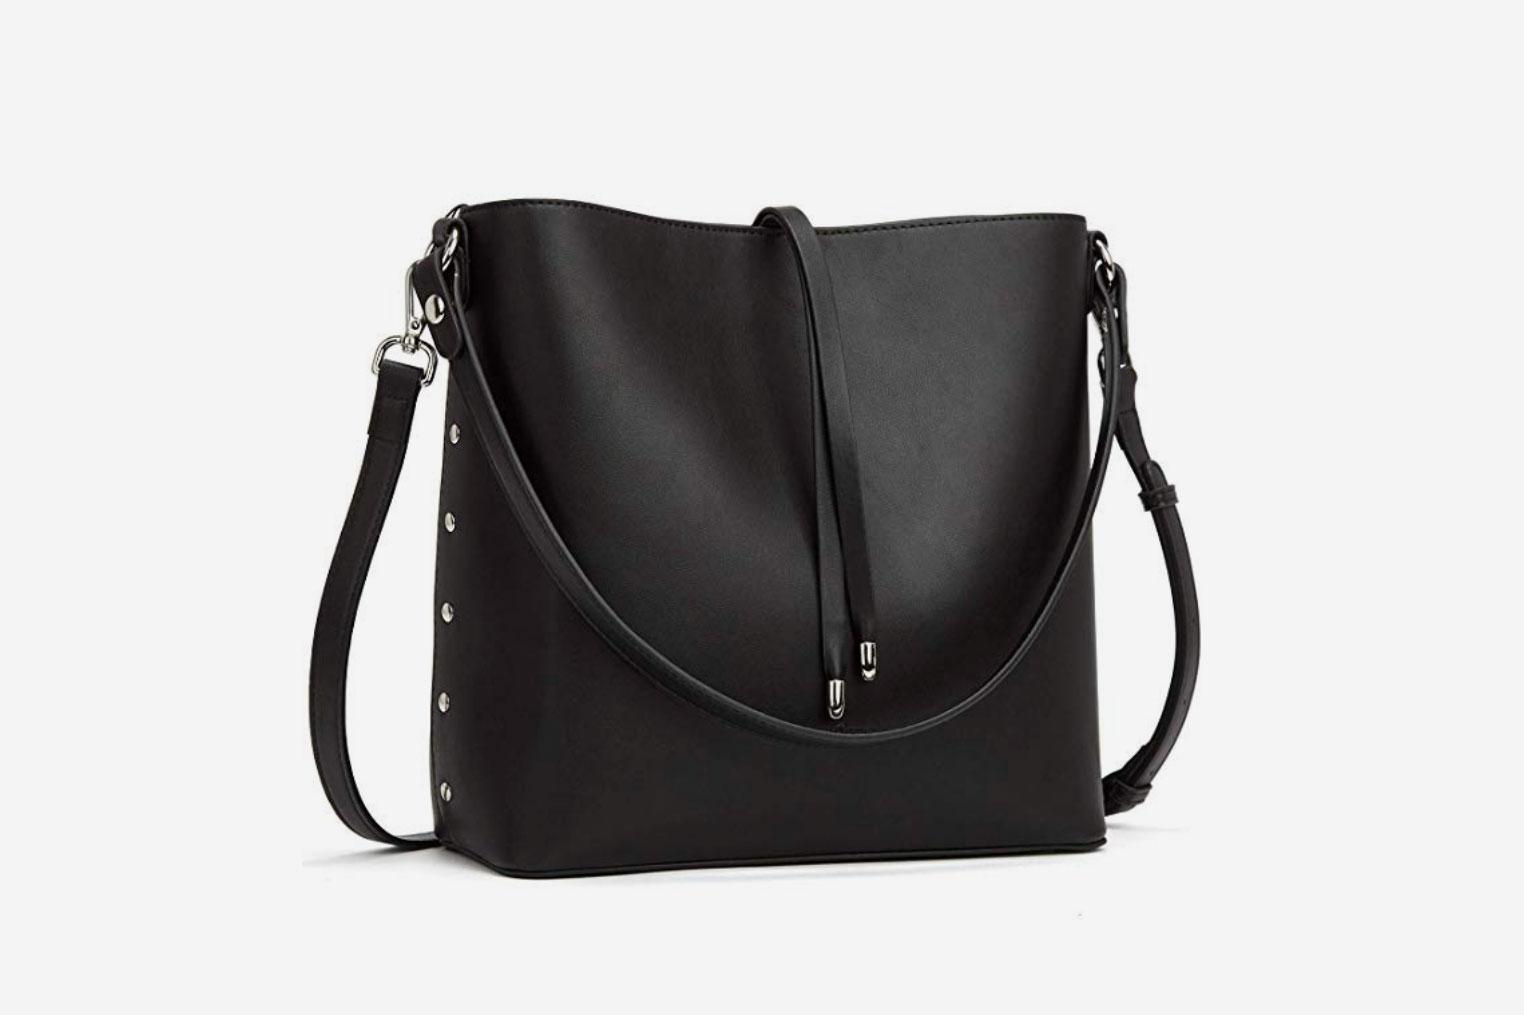 MANTOBRUCE Leather Handbag